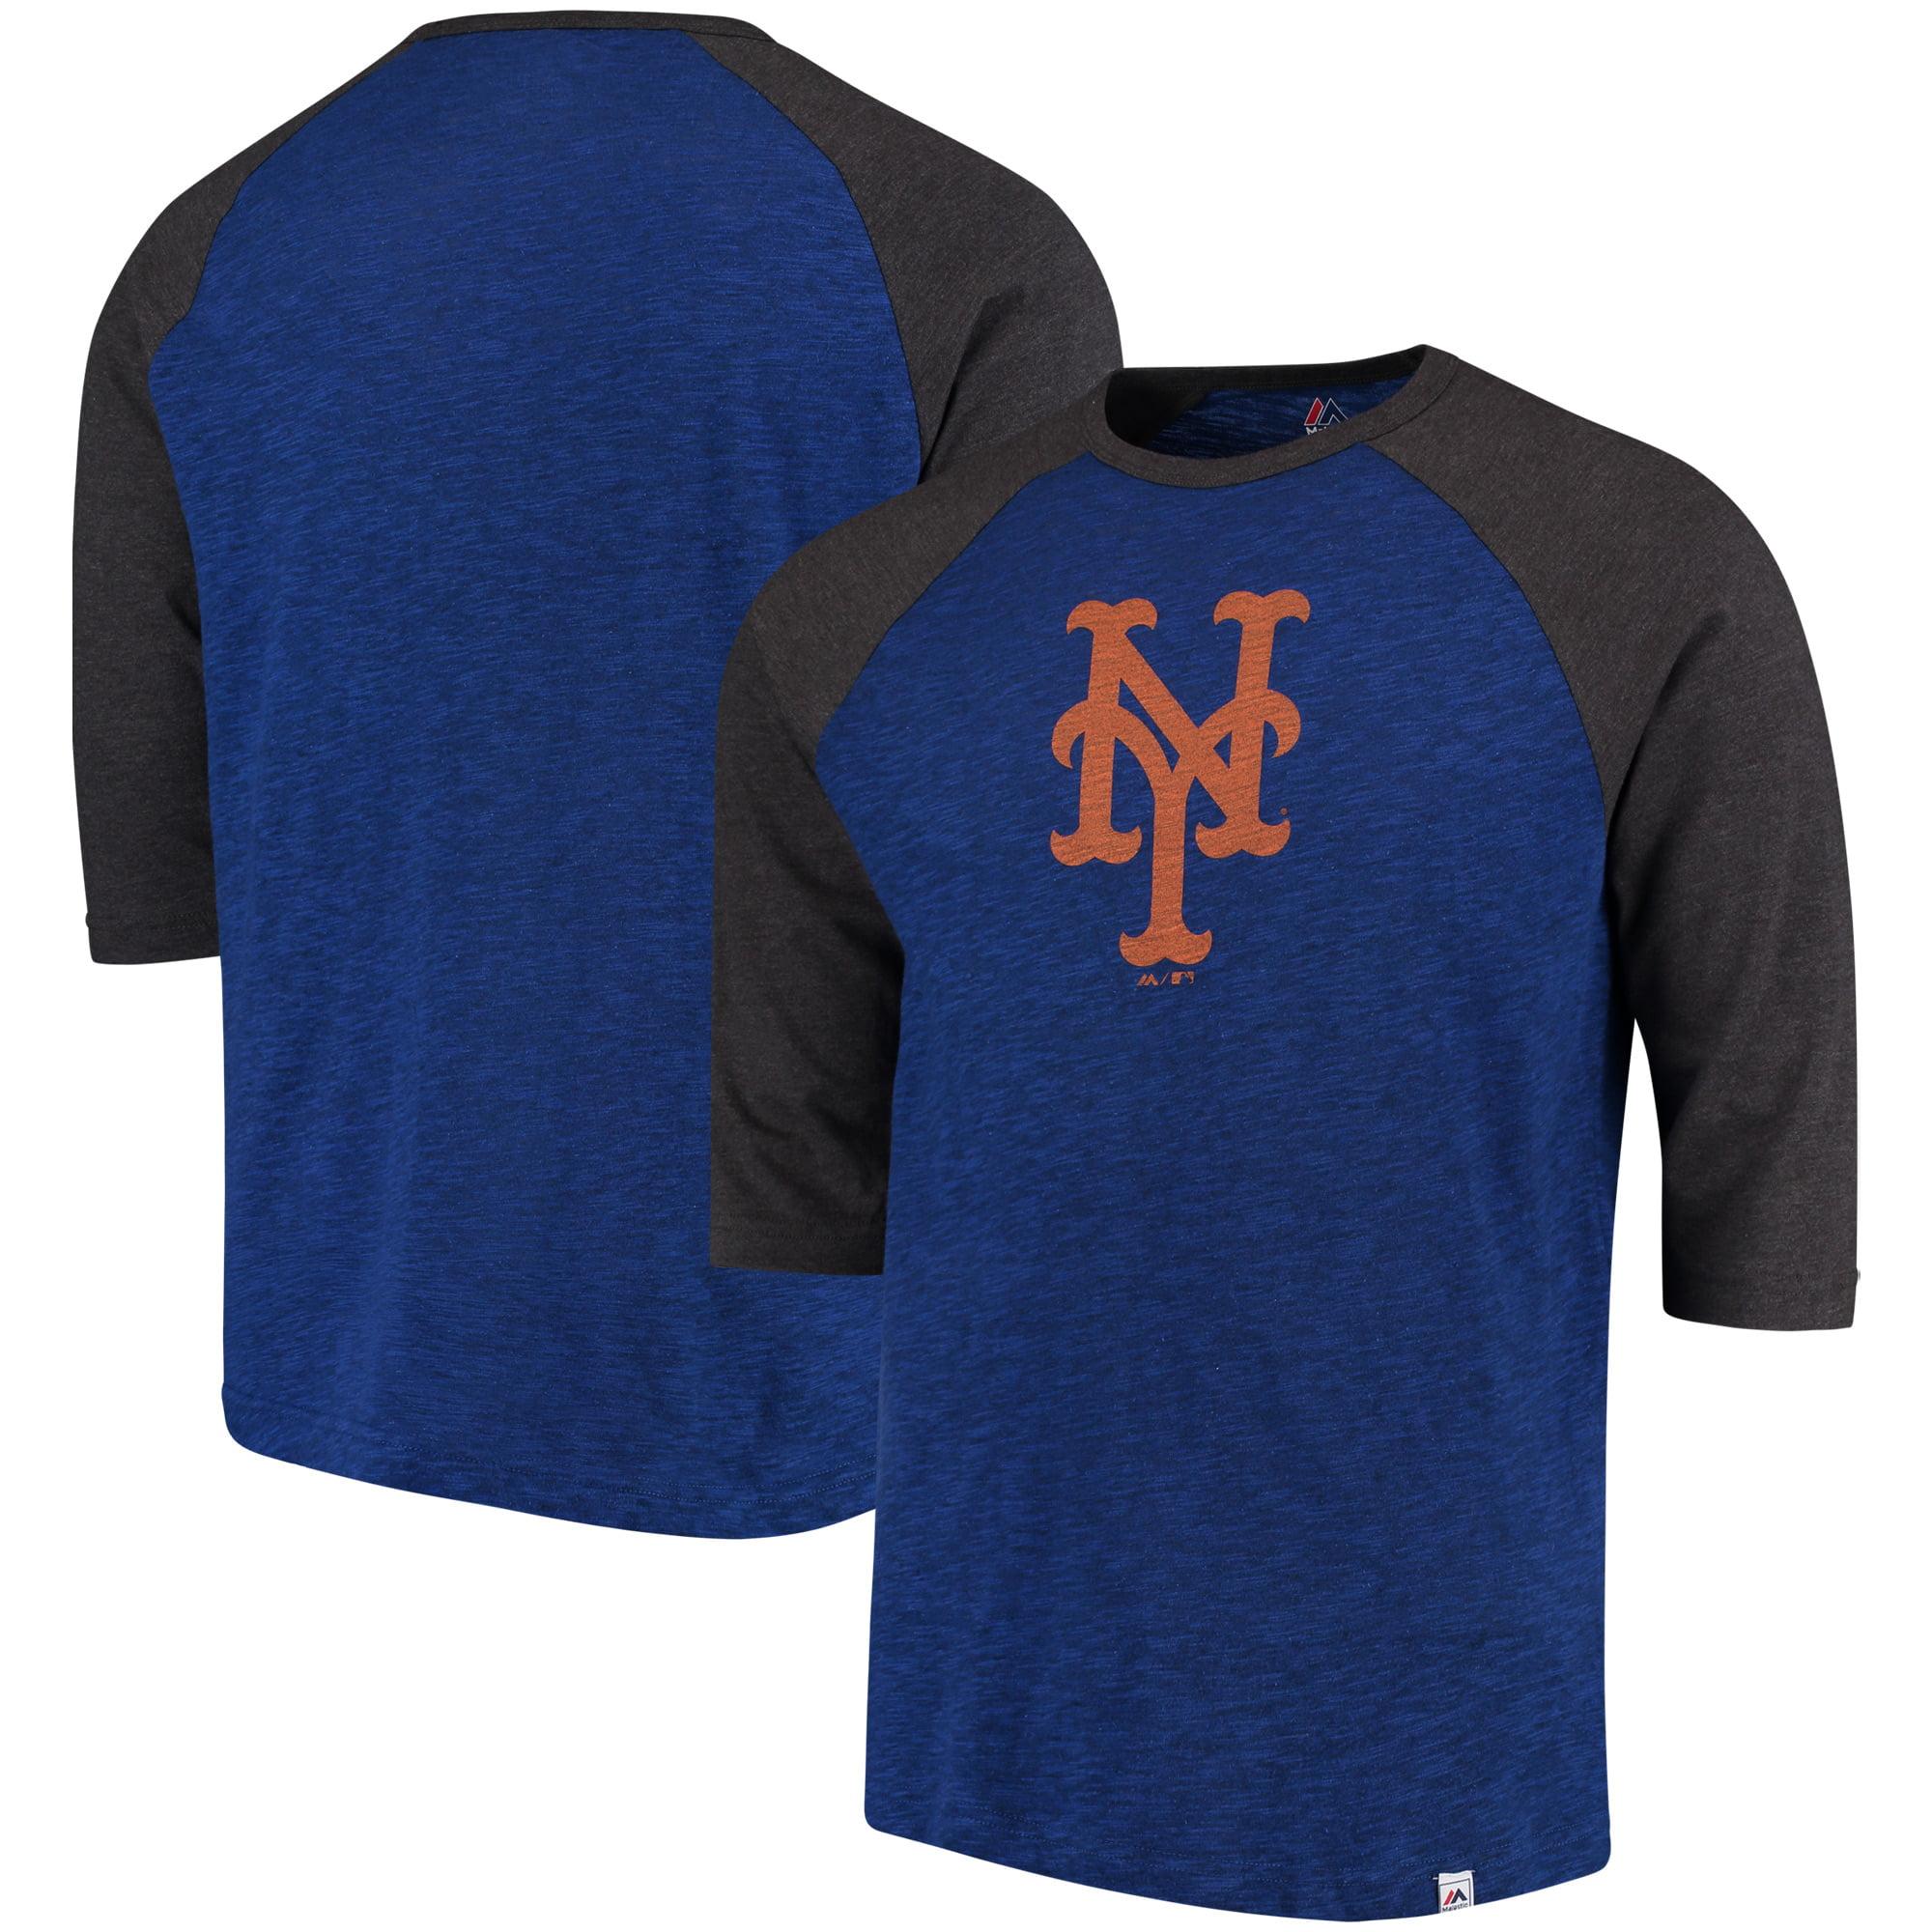 New York Mets Majestic Grueling Ordeal 3/4-Sleeve Raglan T-Shirt - Royal